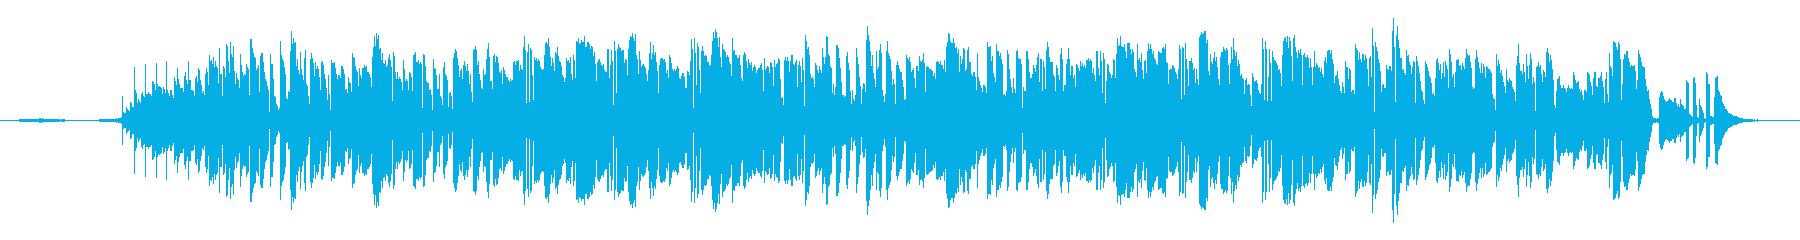 Oyasumi Songの再生済みの波形